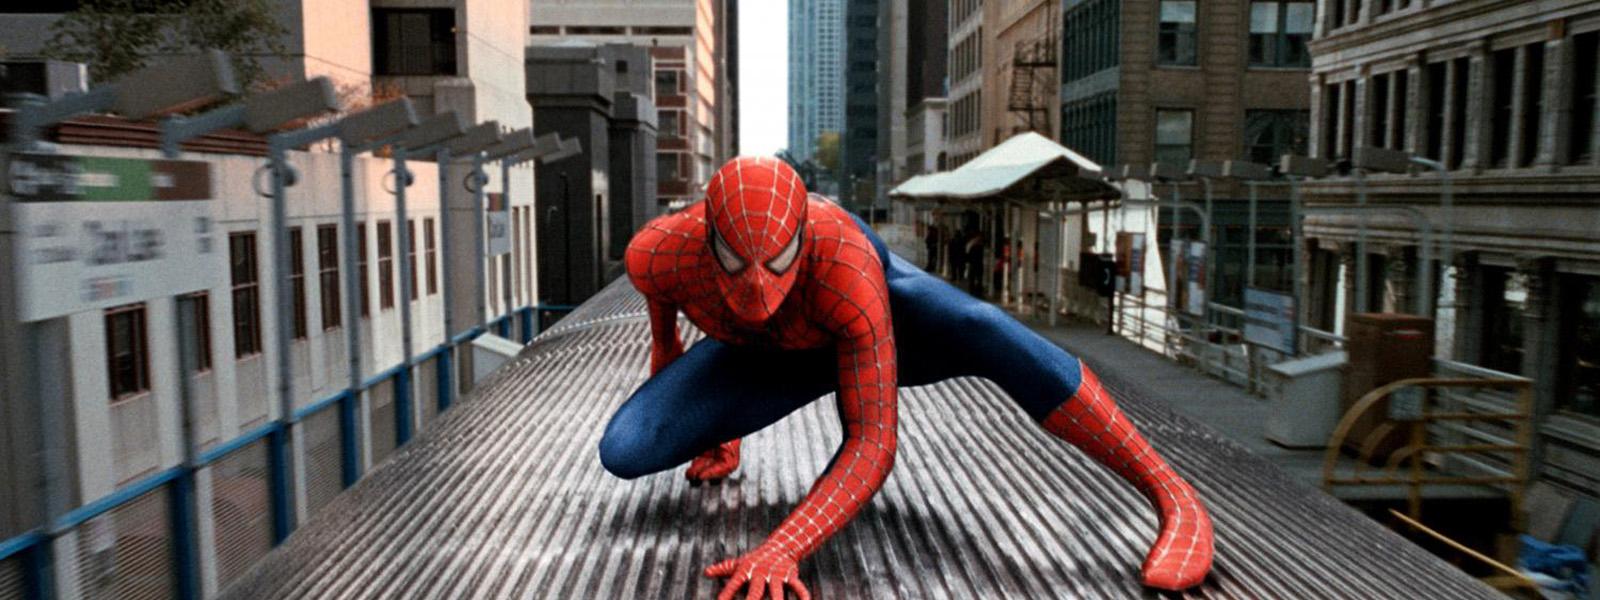 0006 spiderman i arxi foto2